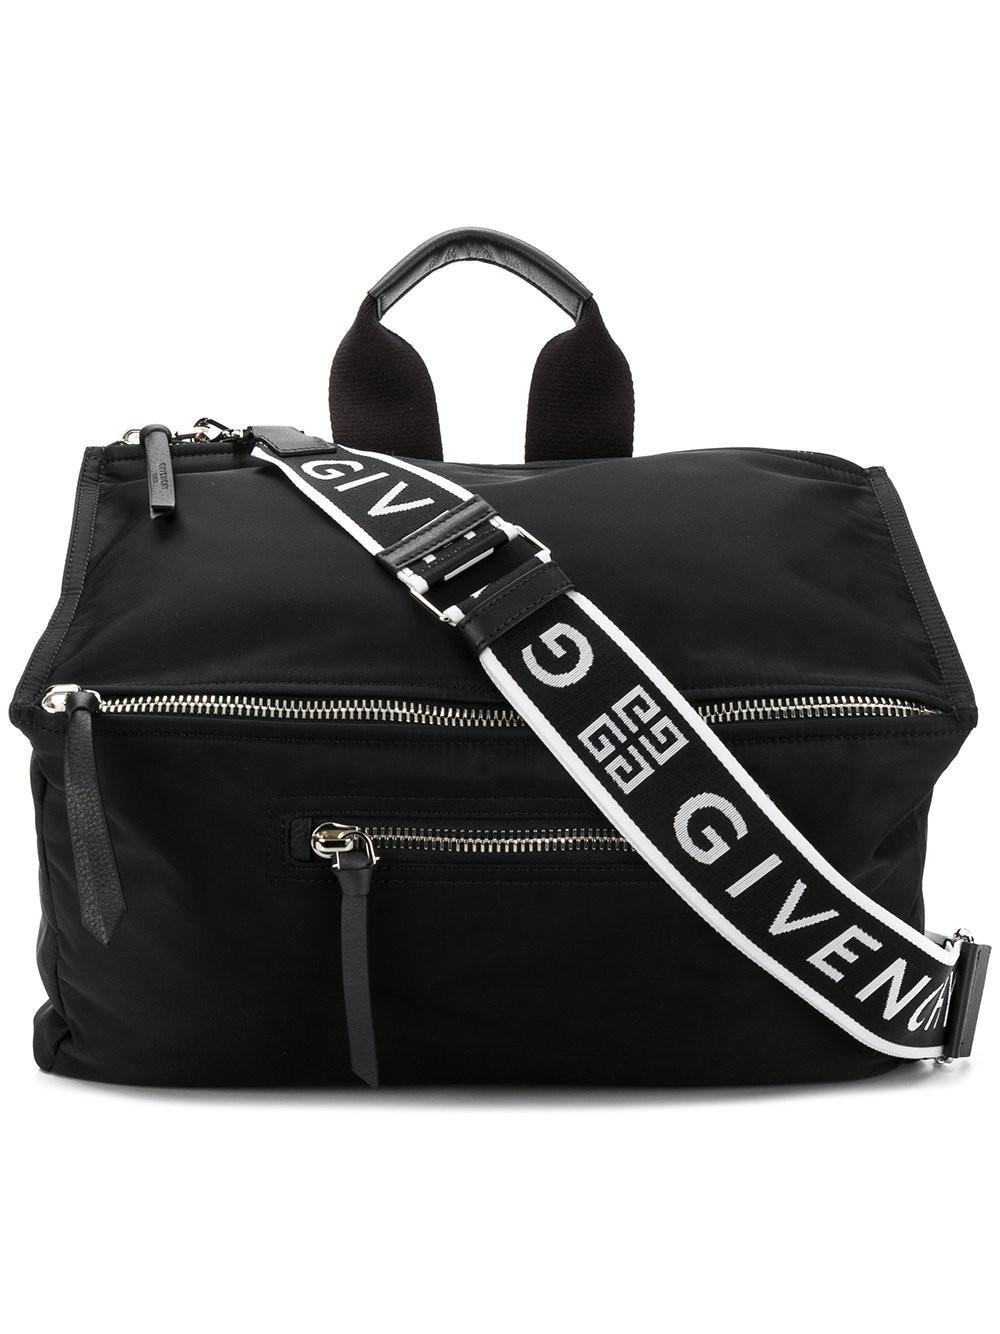 3615e8079263 Givenchy Pandora Bag in Black for Men - Lyst